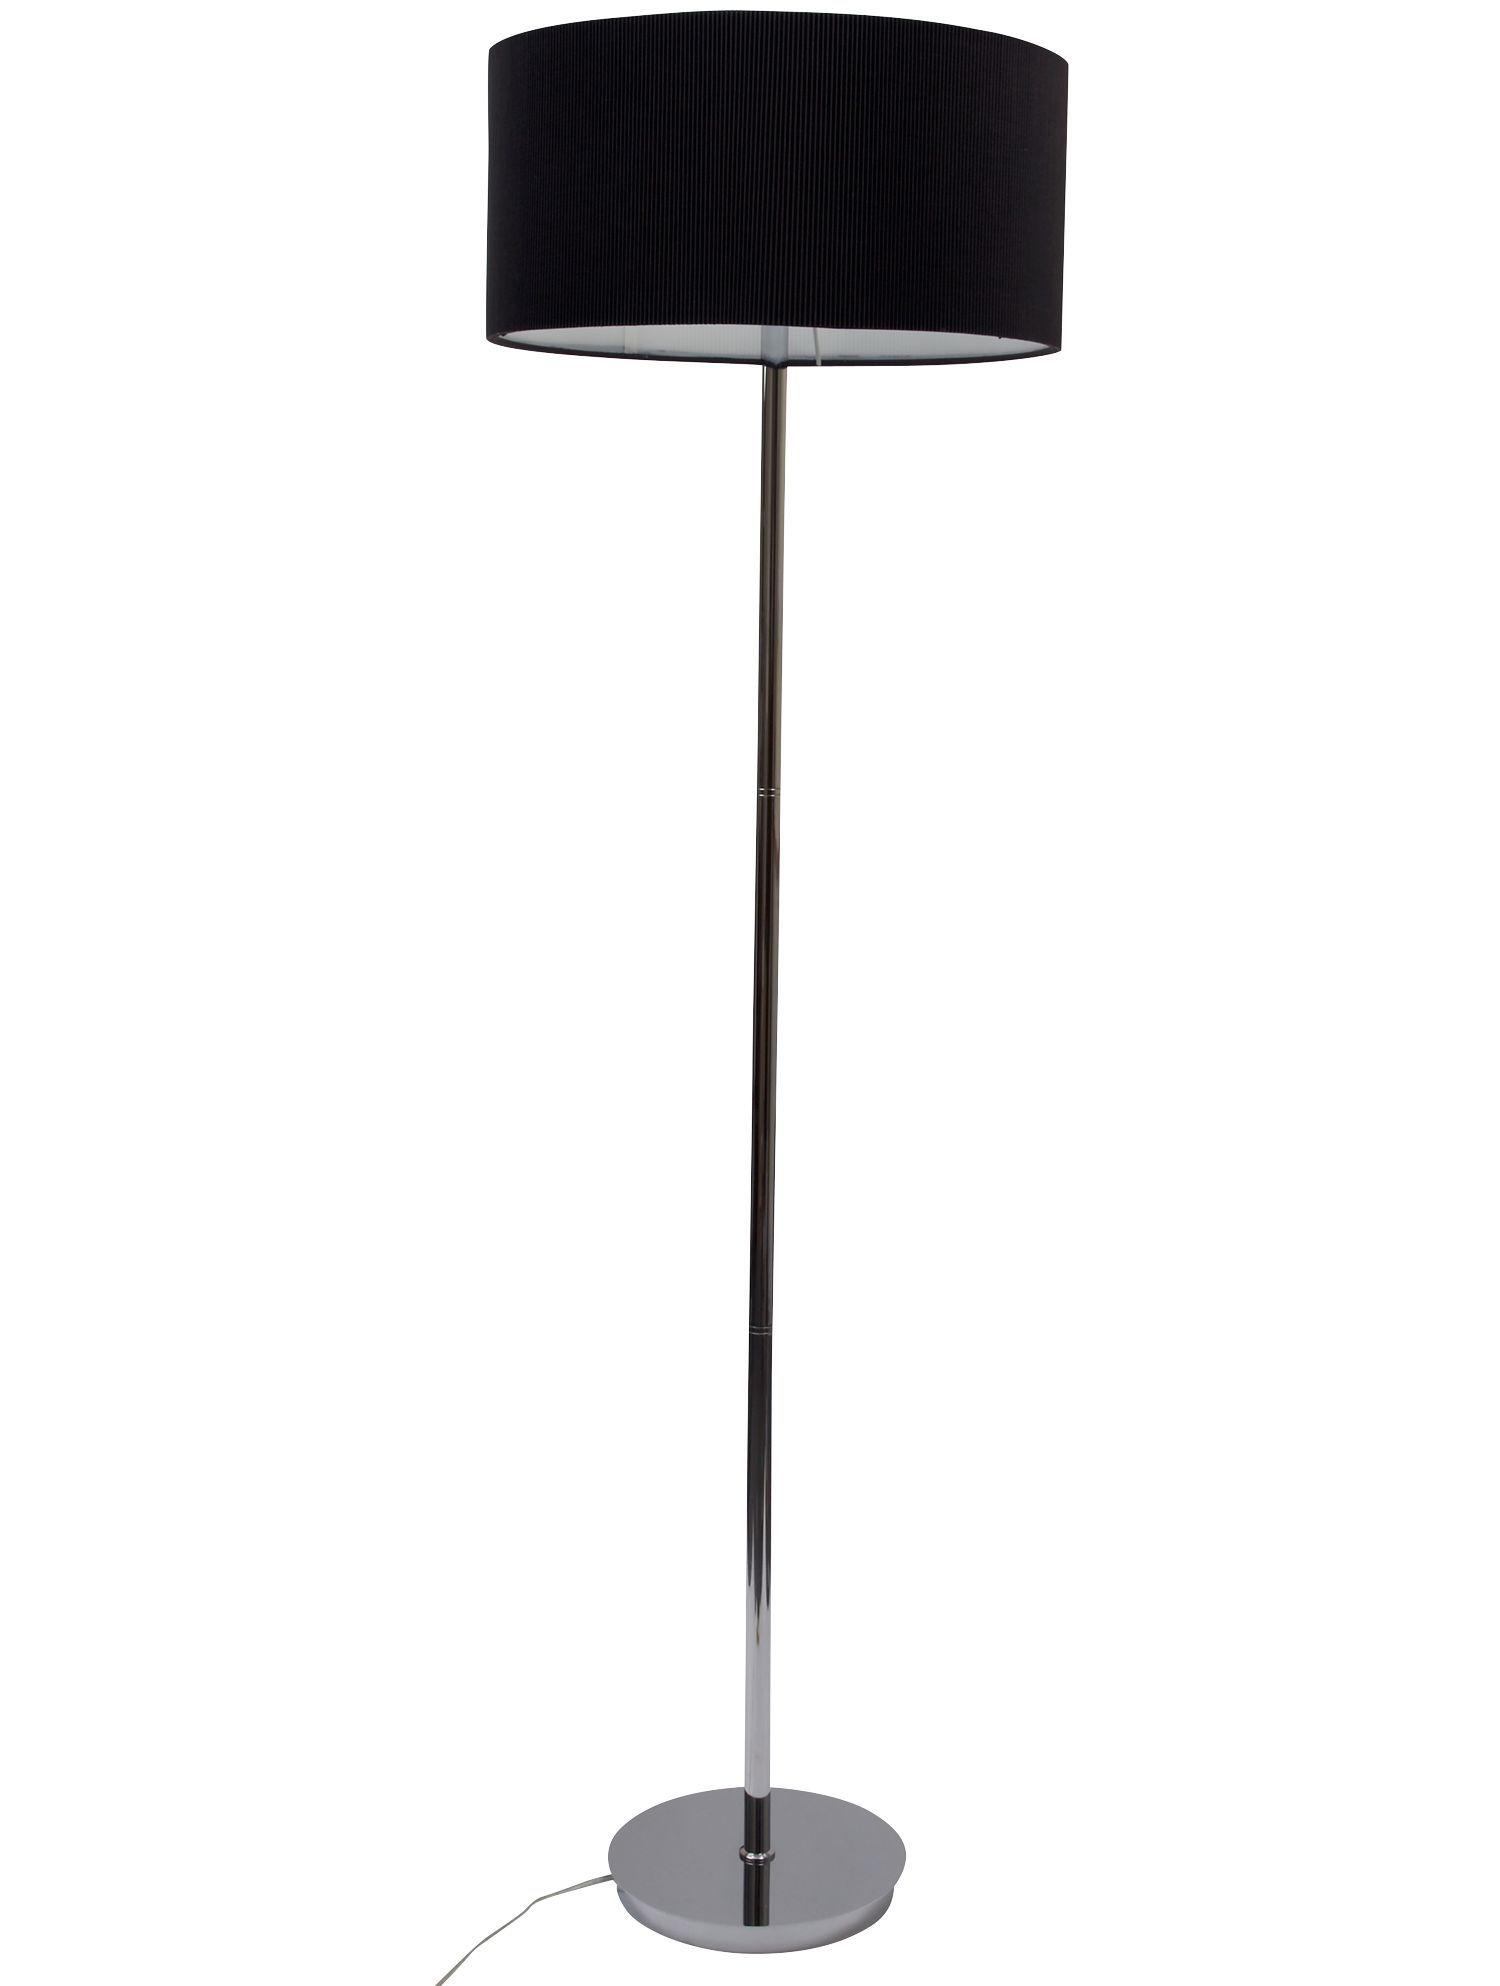 black floor lamp | College Life. | Pinterest | Black floor lamp ...